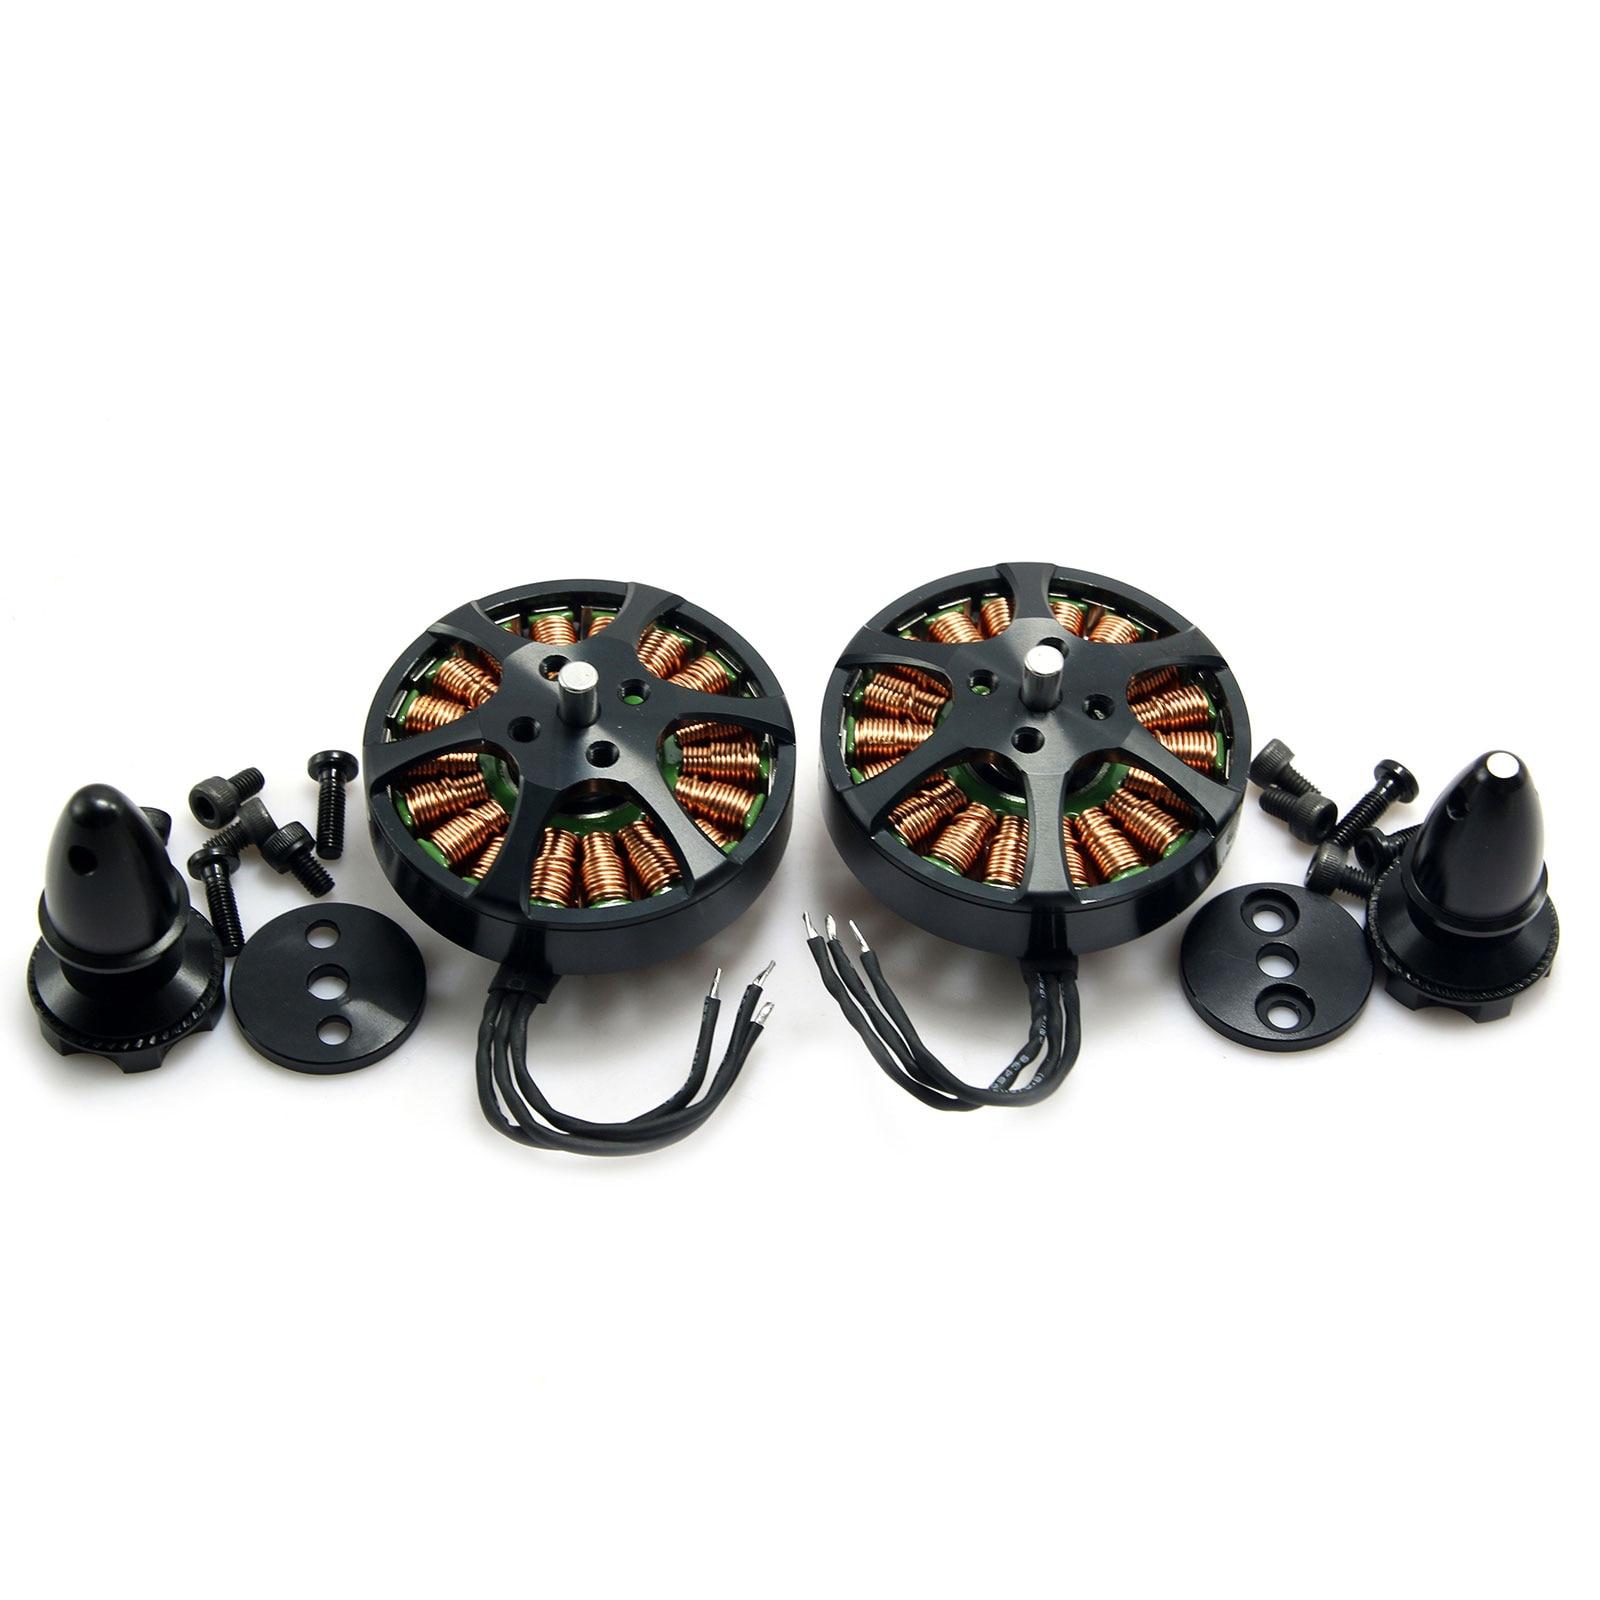 2PCS T Motor Antigravity Motors Series 4006 KV380 18N24P 4 6S for Quad Hexa Octa Multicopter